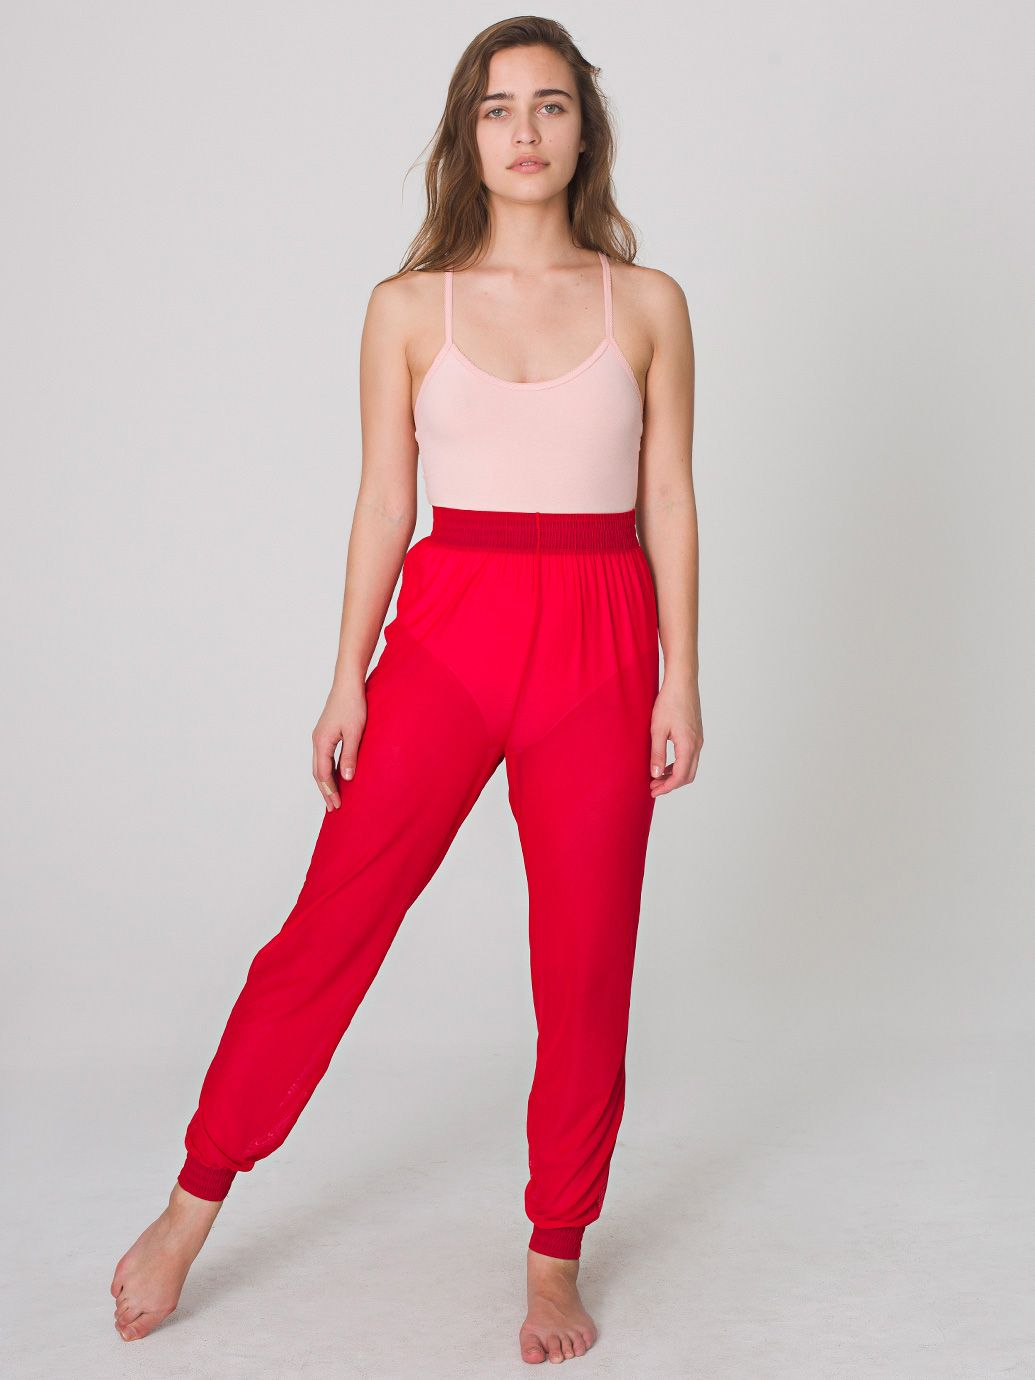 Nylon Spandex Micro-Mesh Jumper Pant | Harem | Women's Pants | American Apparel